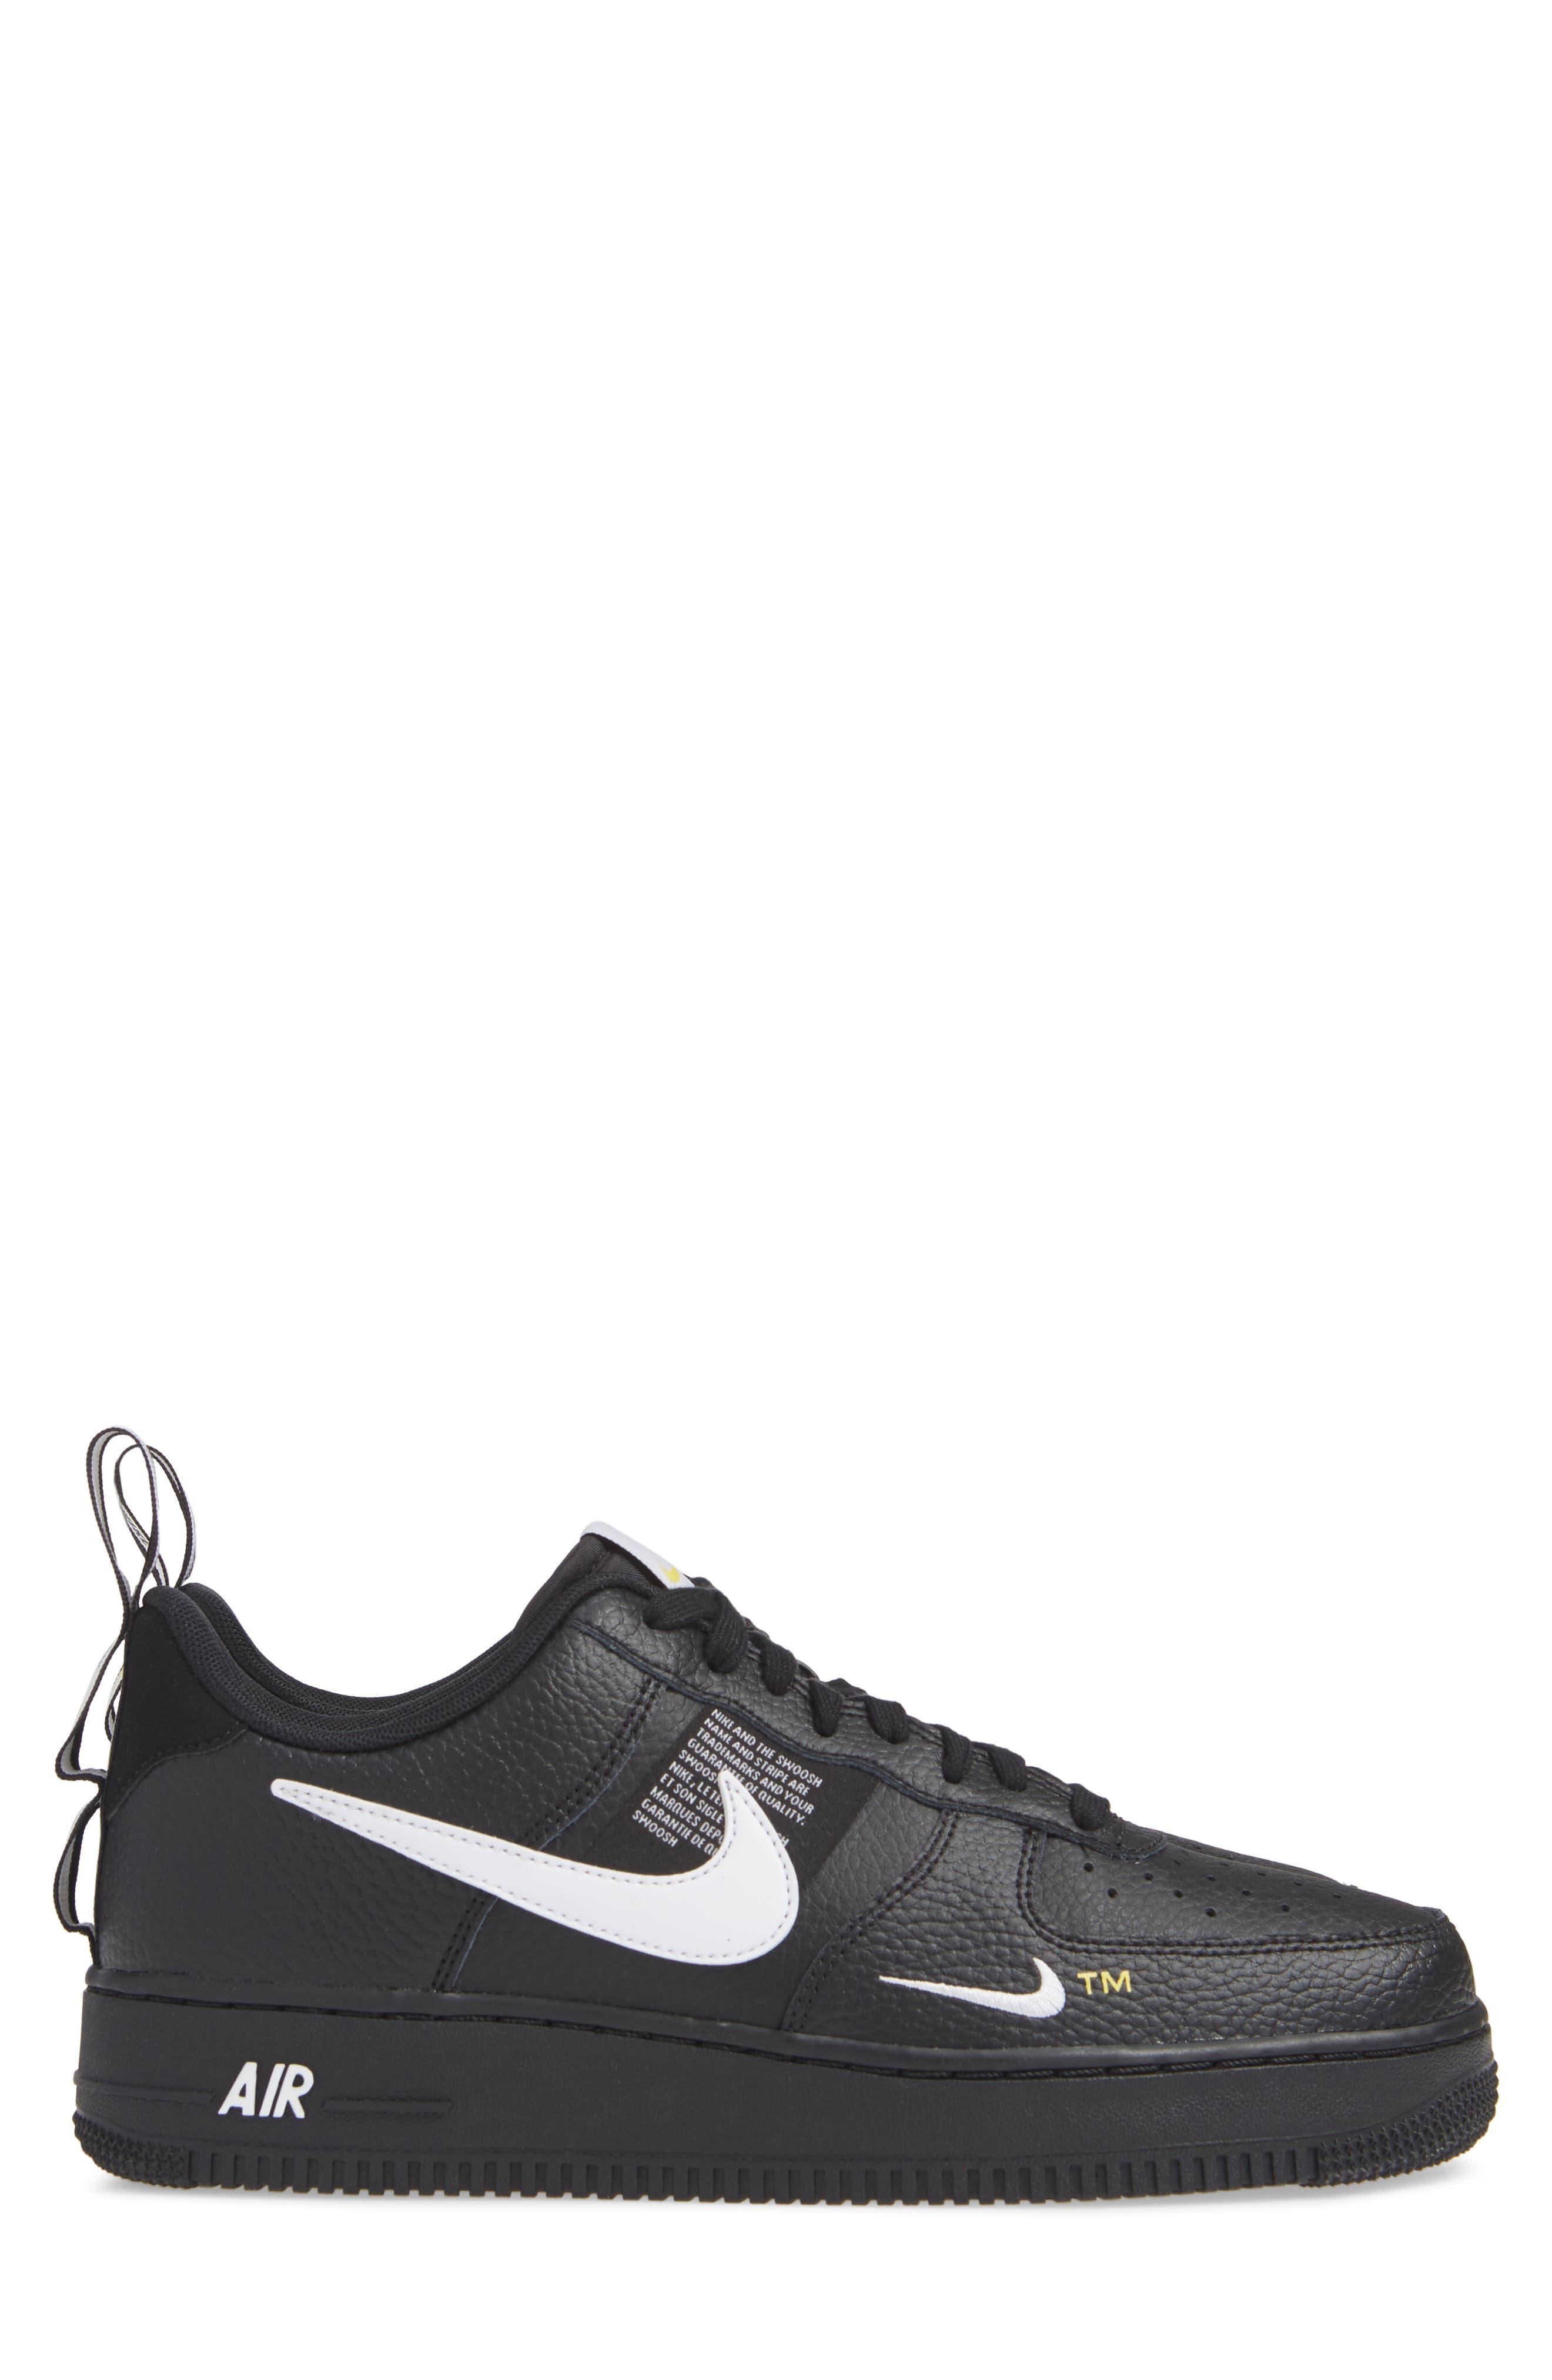 Air Force 1 '07 LV8 Utility Sneaker,                             Alternate thumbnail 4, color,                             BLACK/ WHITE/ TOUR YELLOW